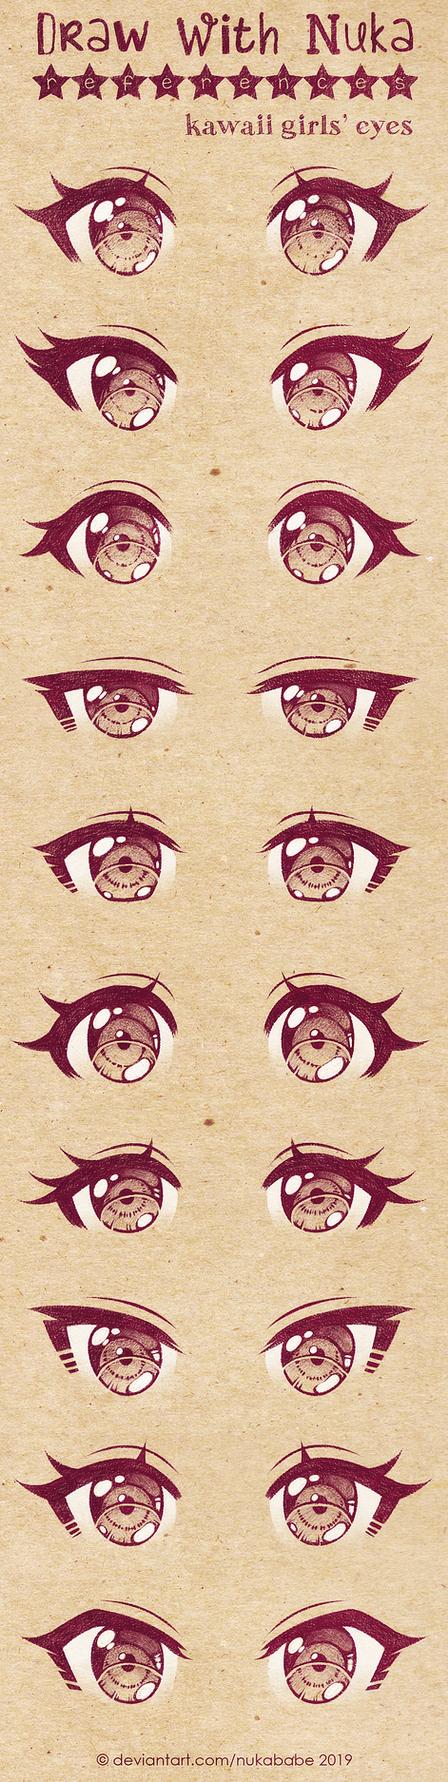 Anime Eyes Reference